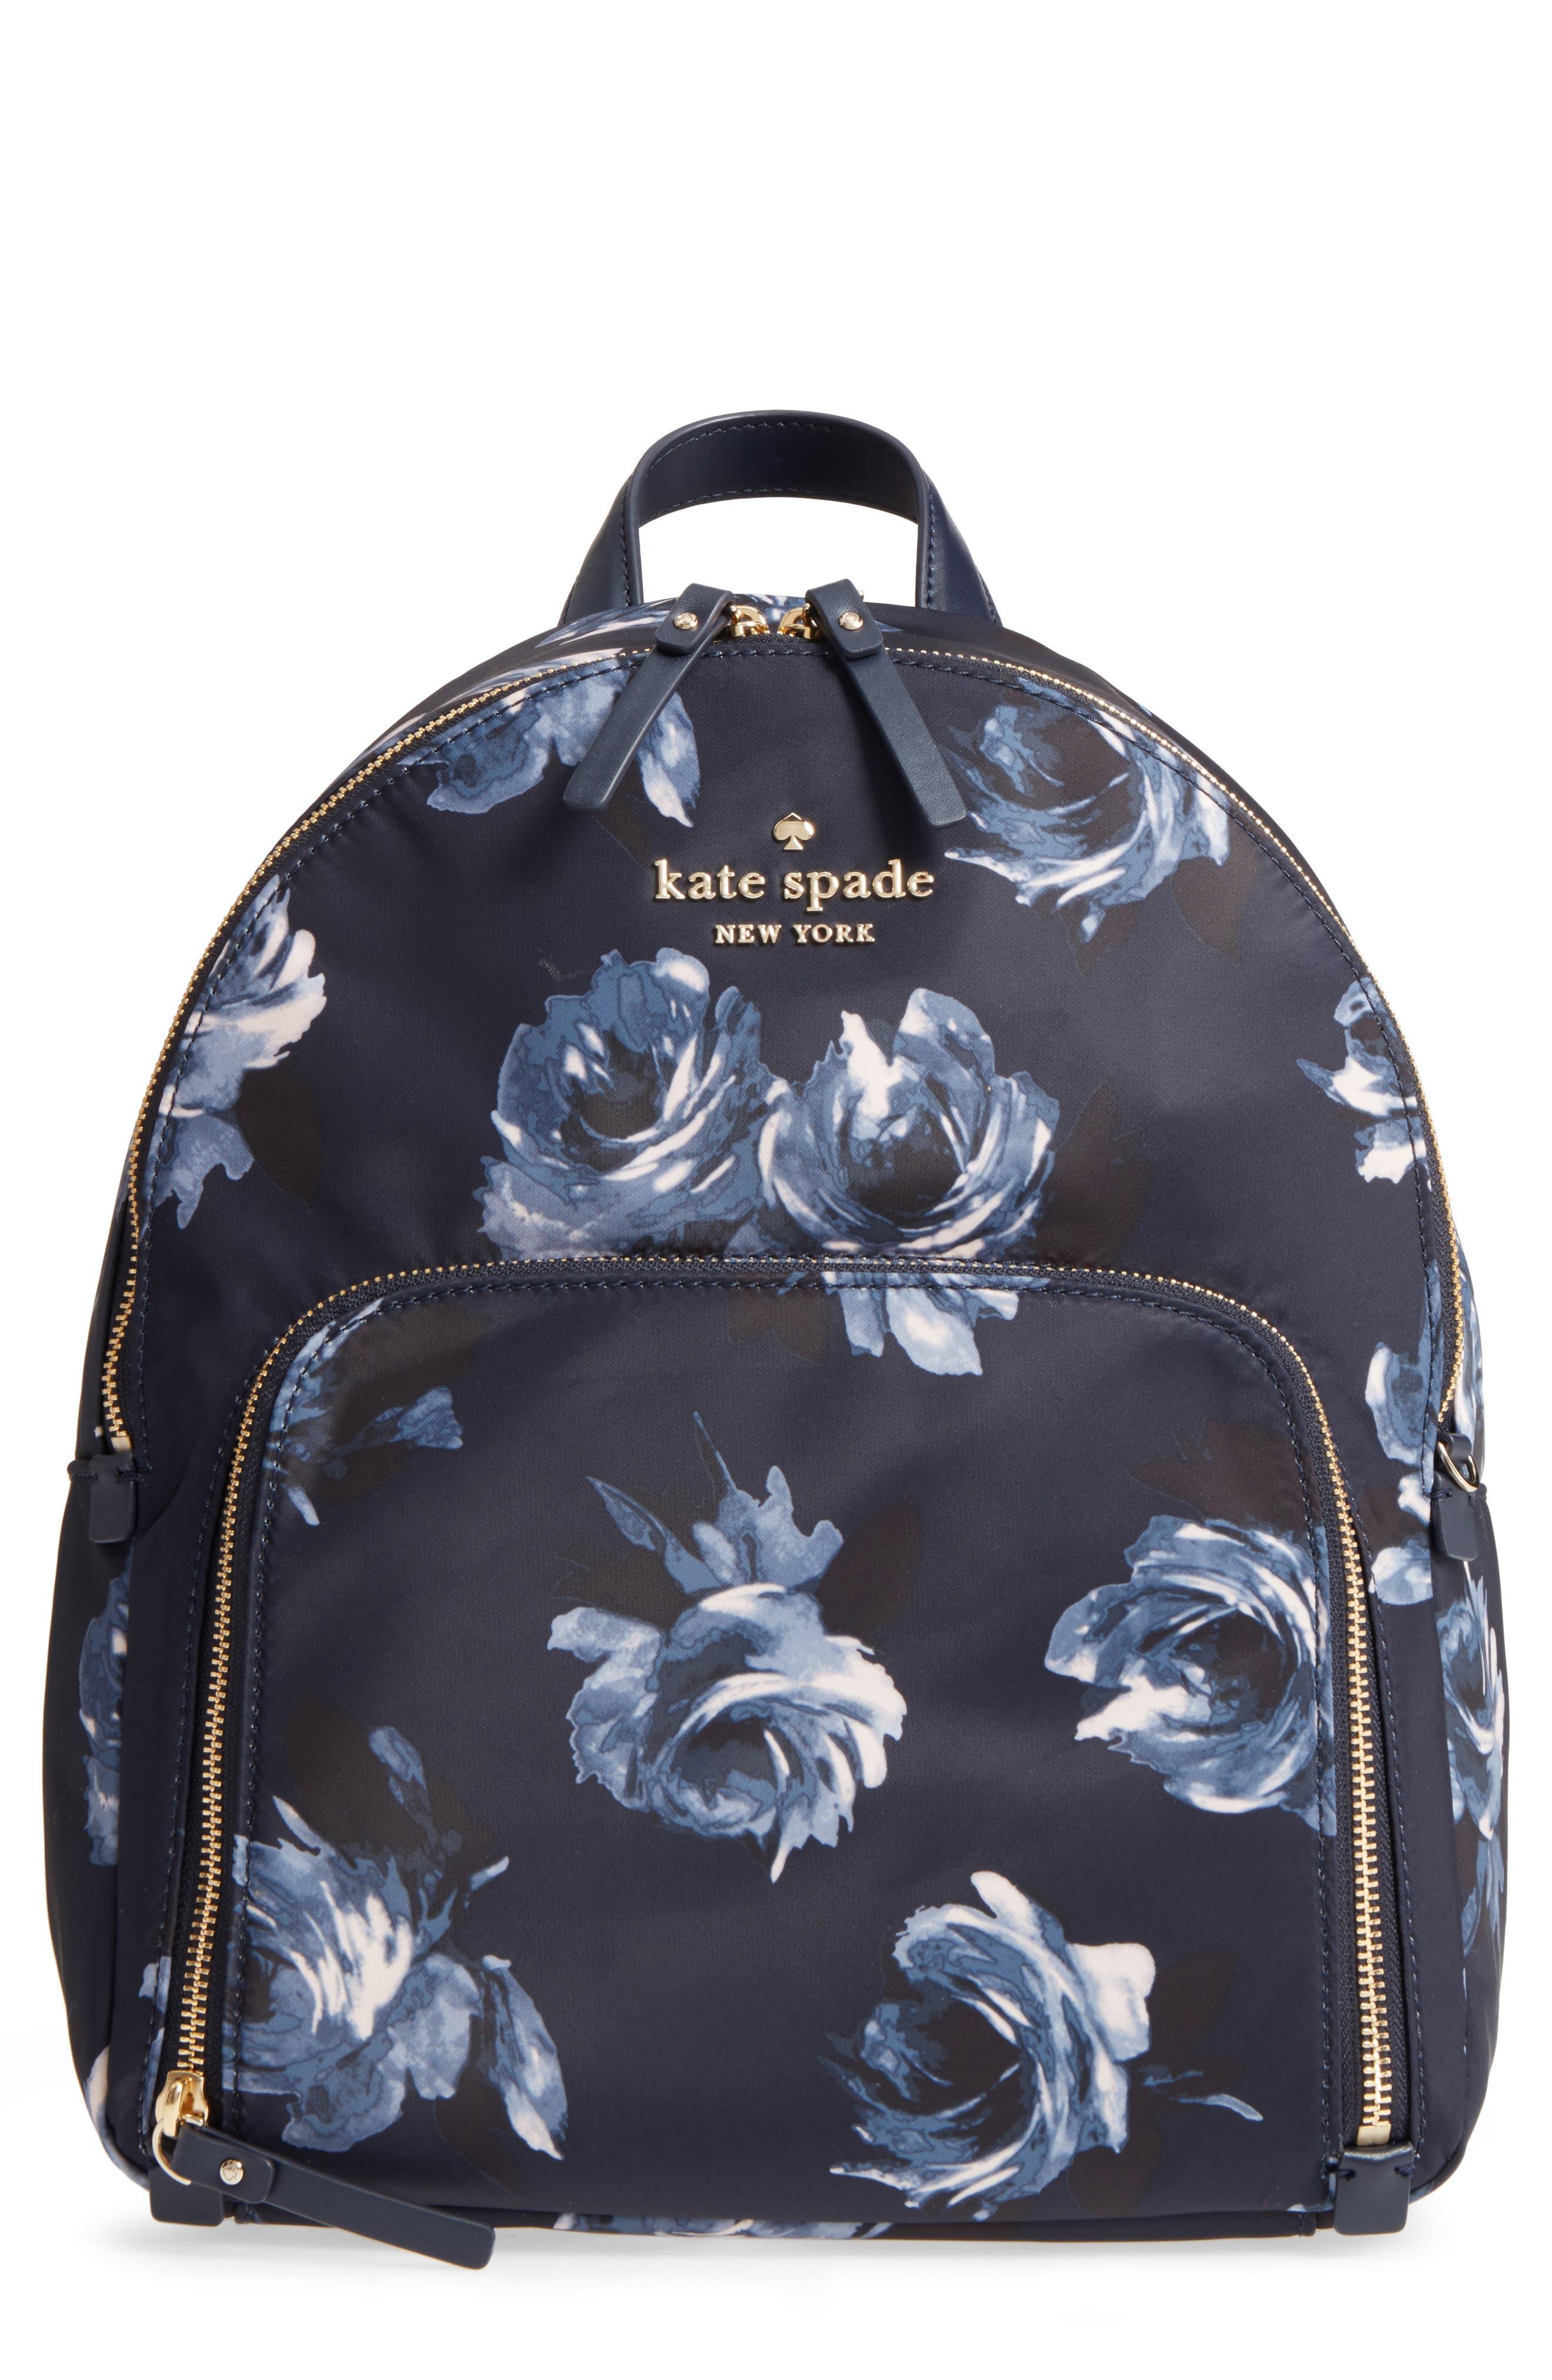 watson lane night rose hartley nylon backpack,                             Main thumbnail 1, color,                             Night Rose